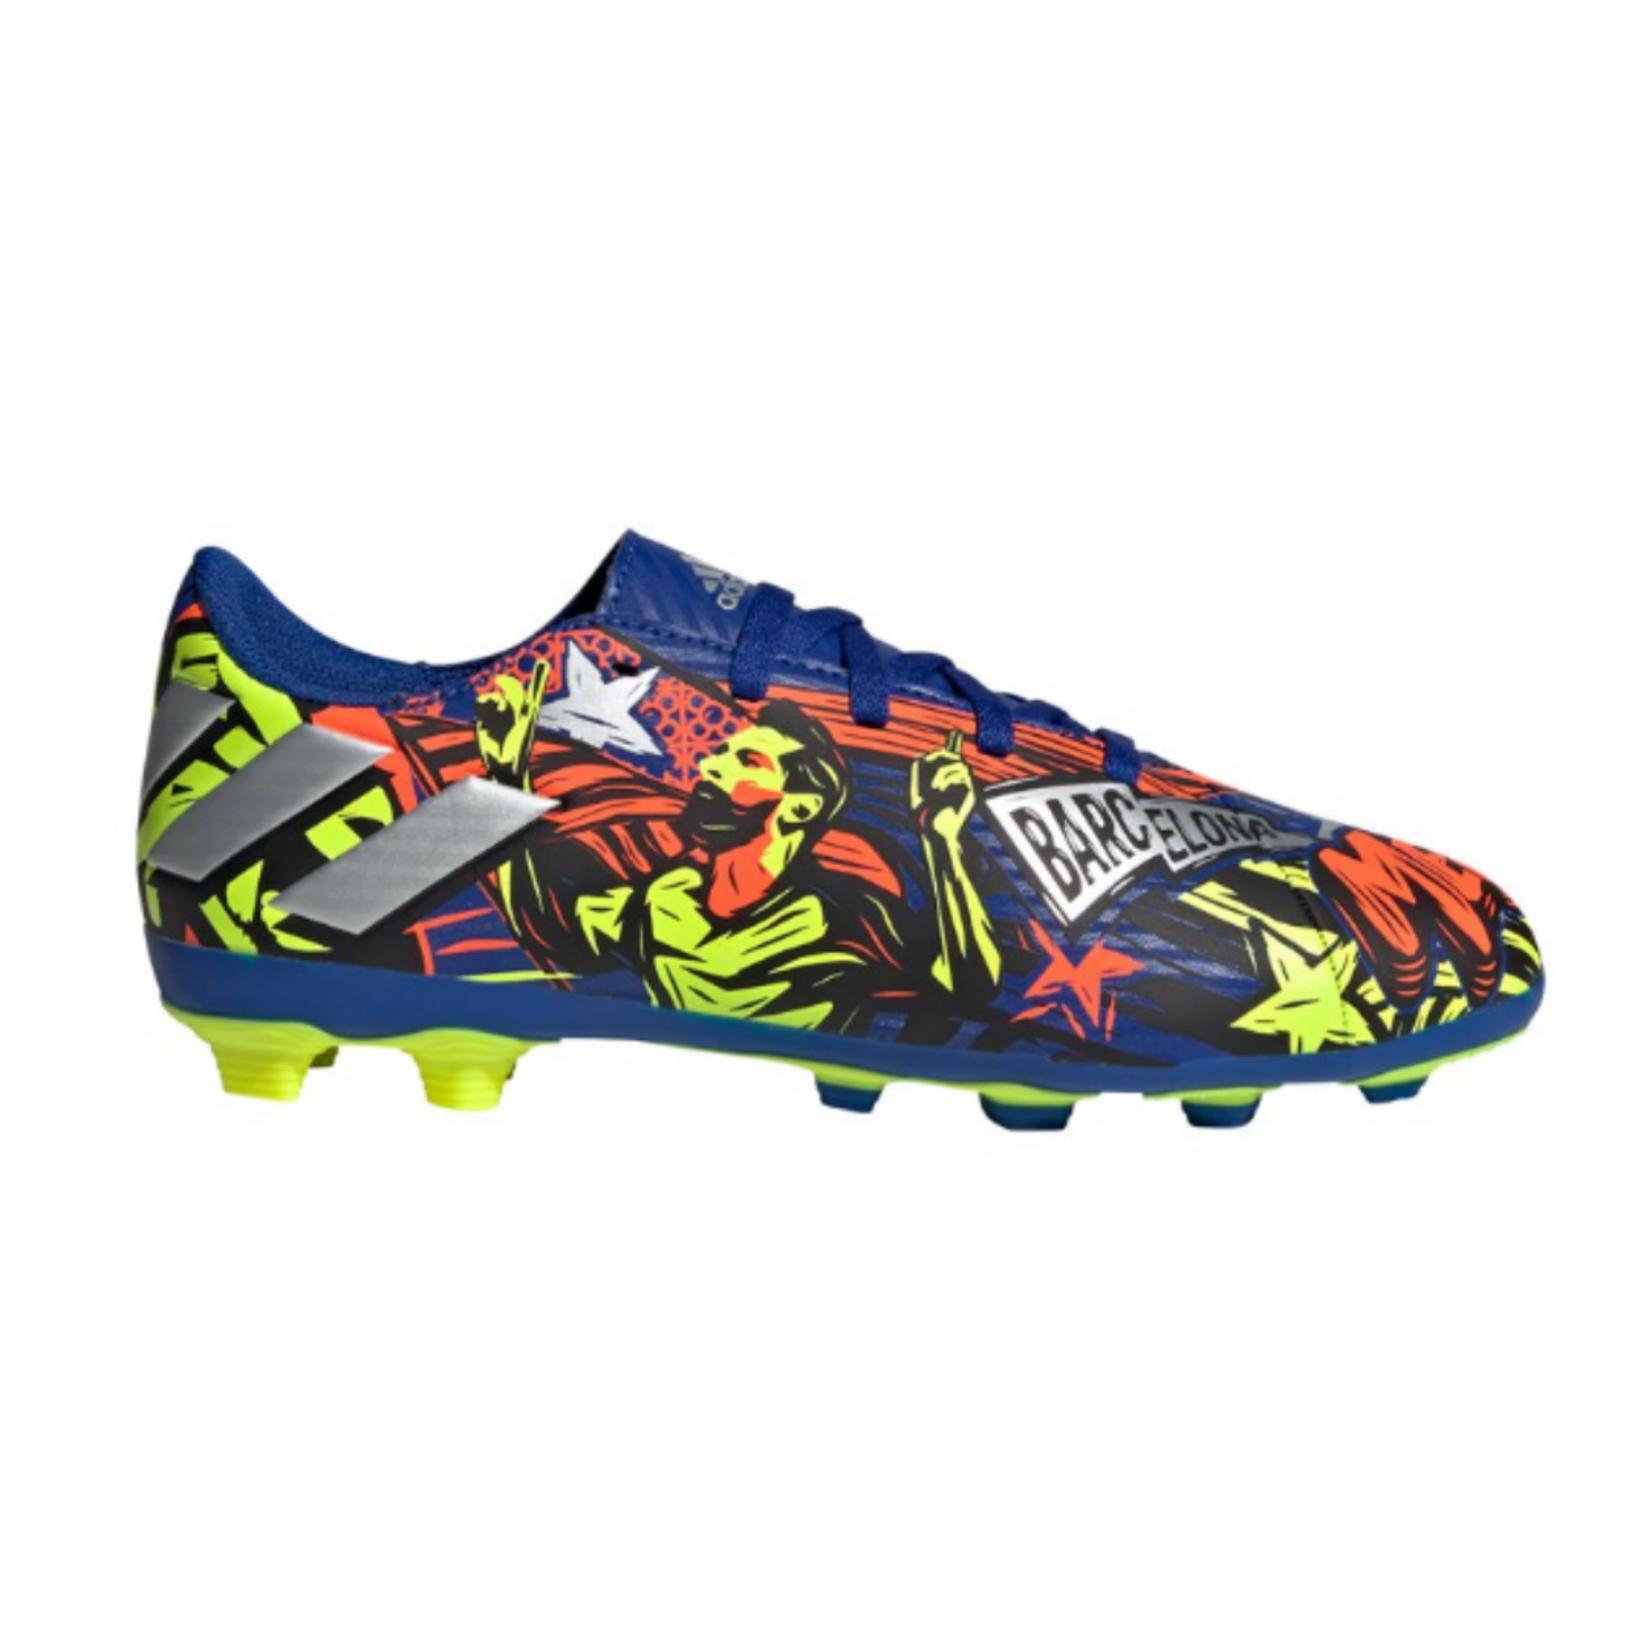 Adidas Adidas Nemeziz Messi 19.4 FxG Soccer Cleat - Jr